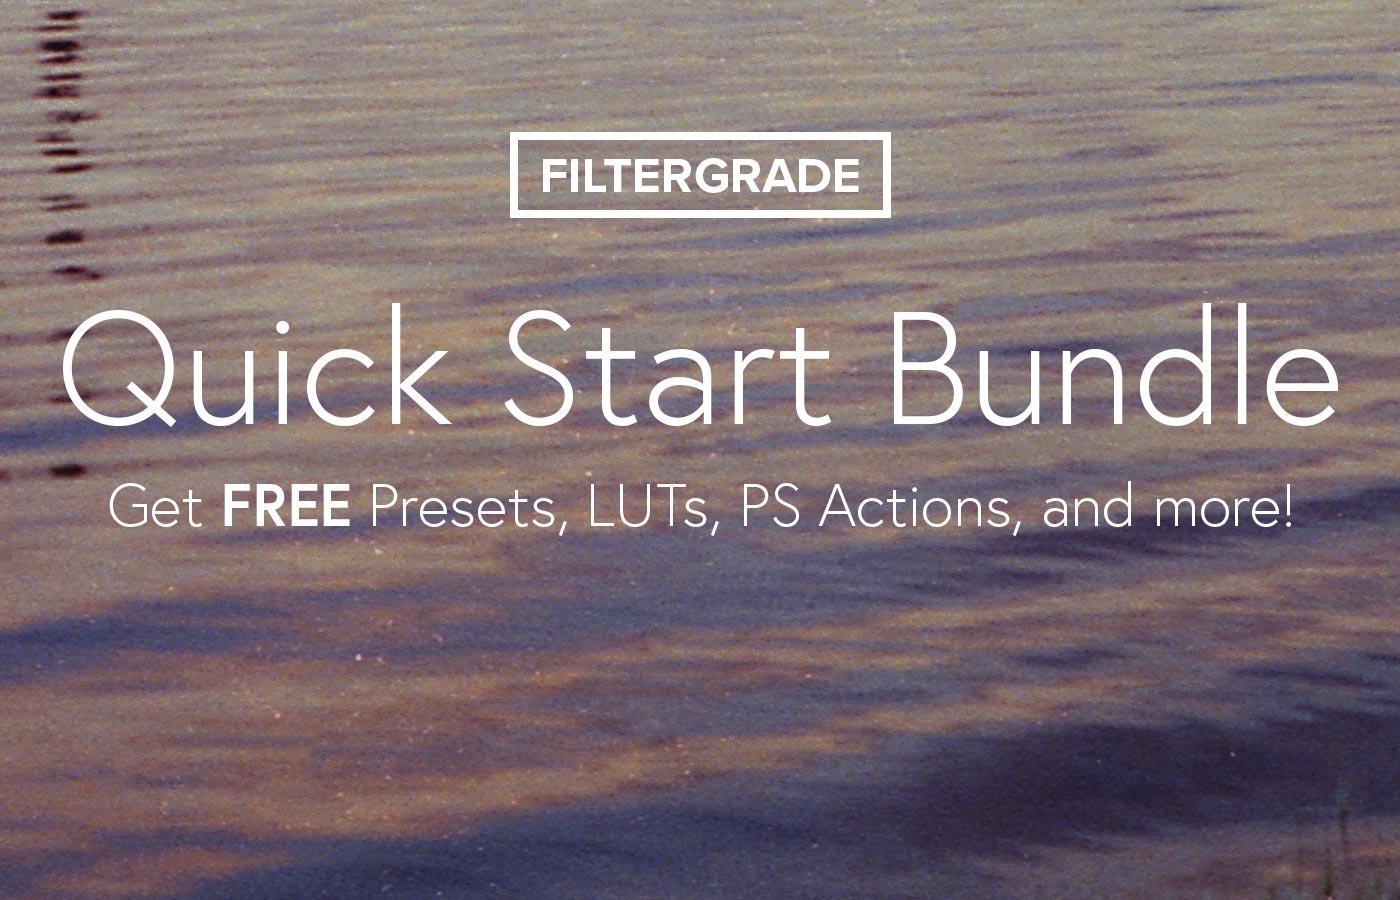 FilterGrade Quick Start Bundle